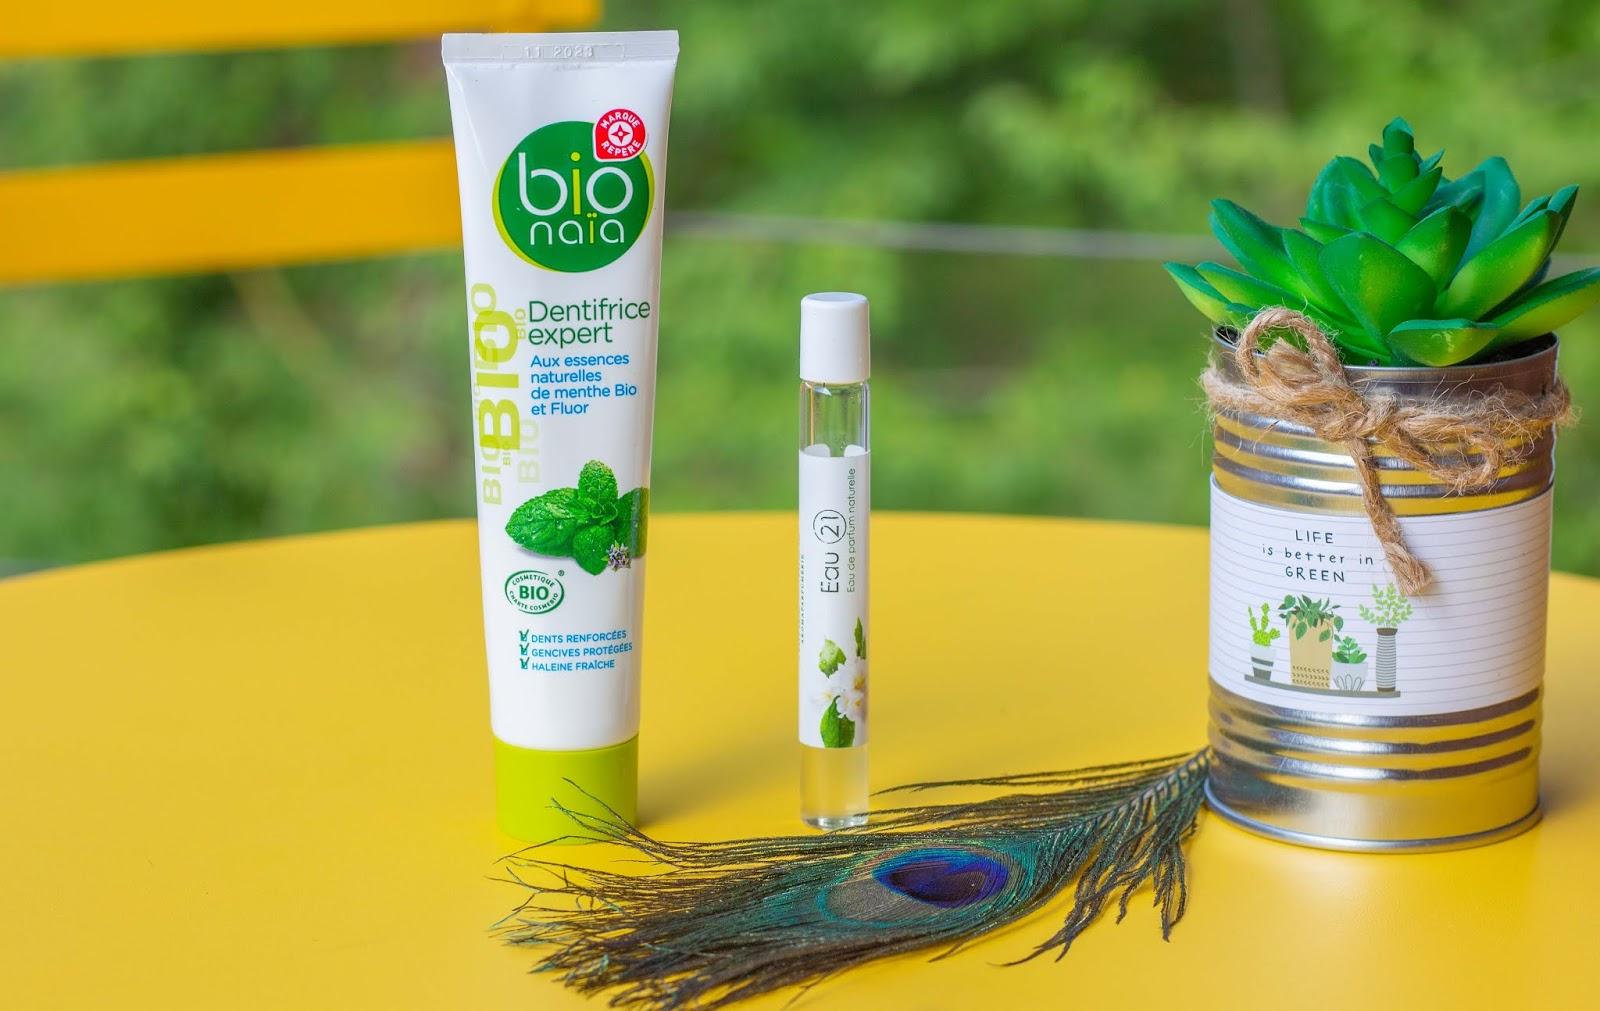 mes-produits-bio-favoris-greenbeauty